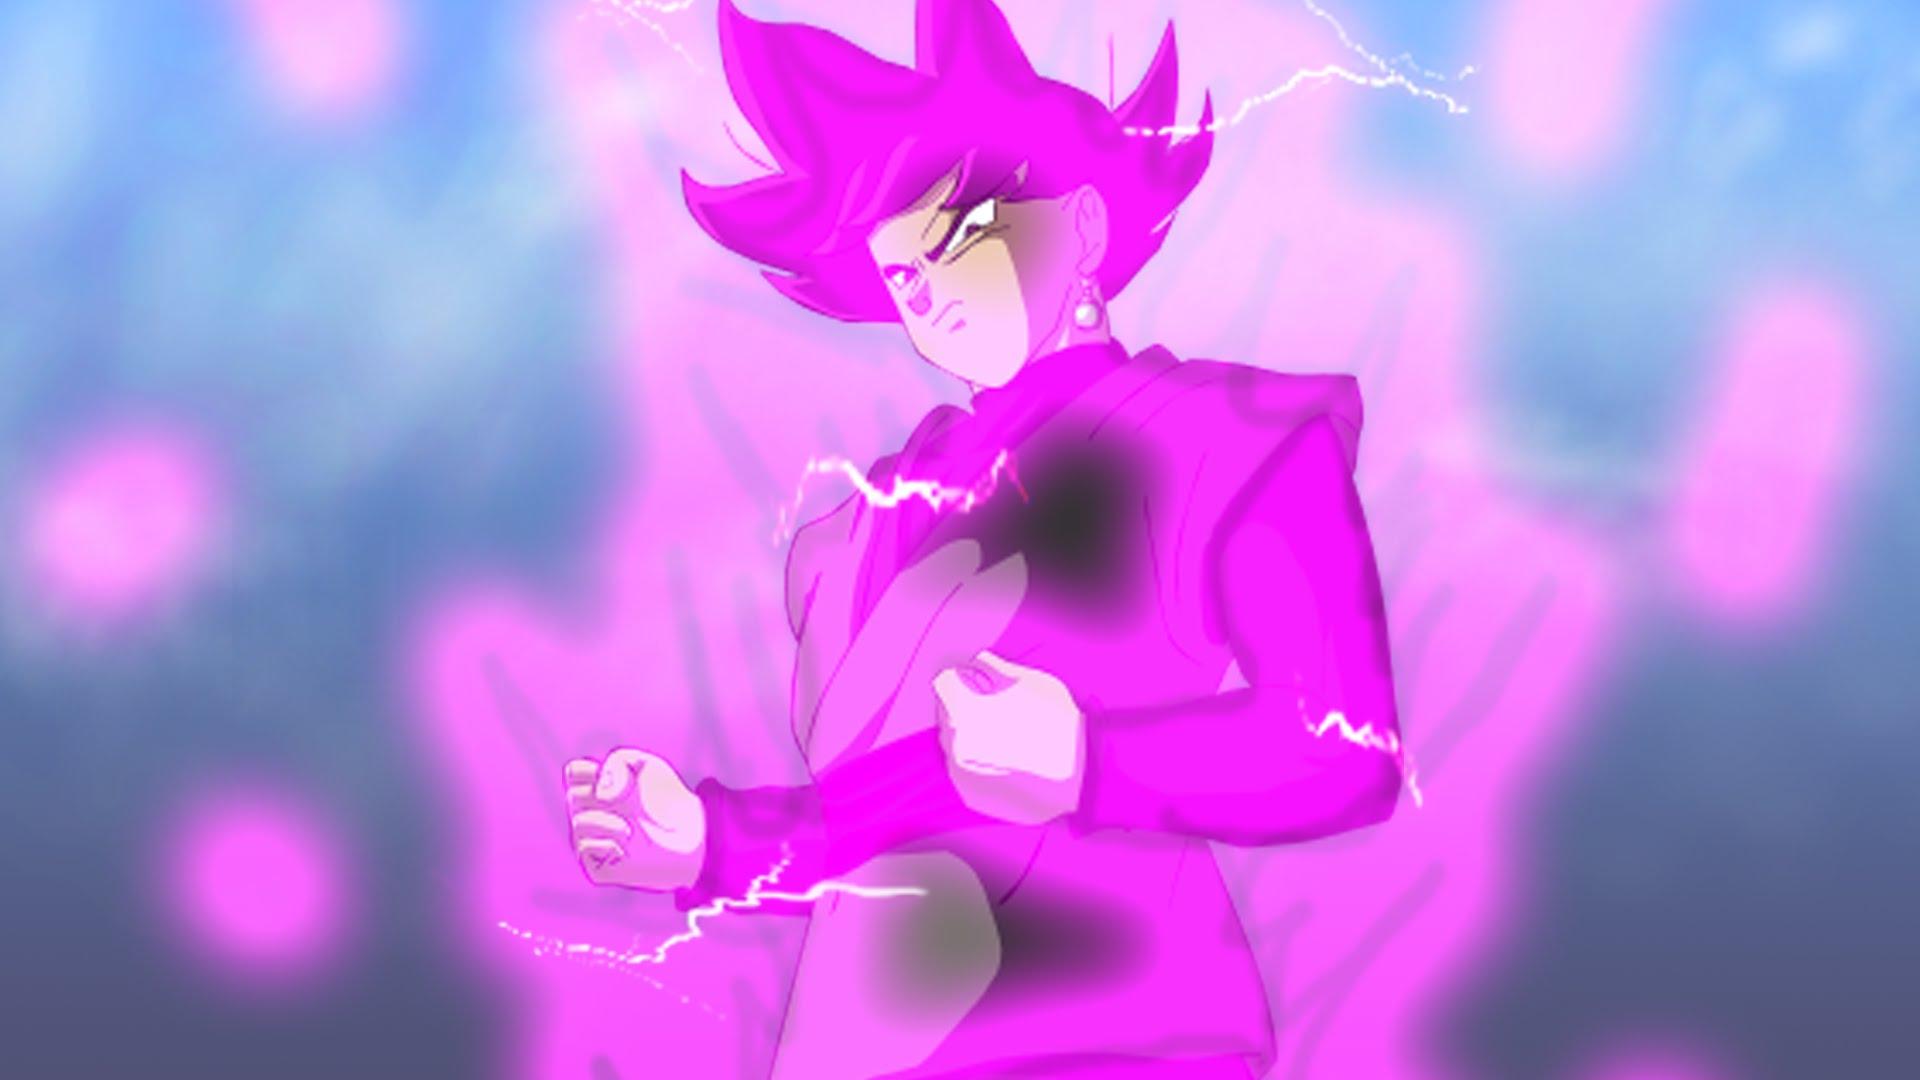 Goku Black Super Saiyan Rose Wallpaper Hd 1920x1080 Wallpaper Teahub Io